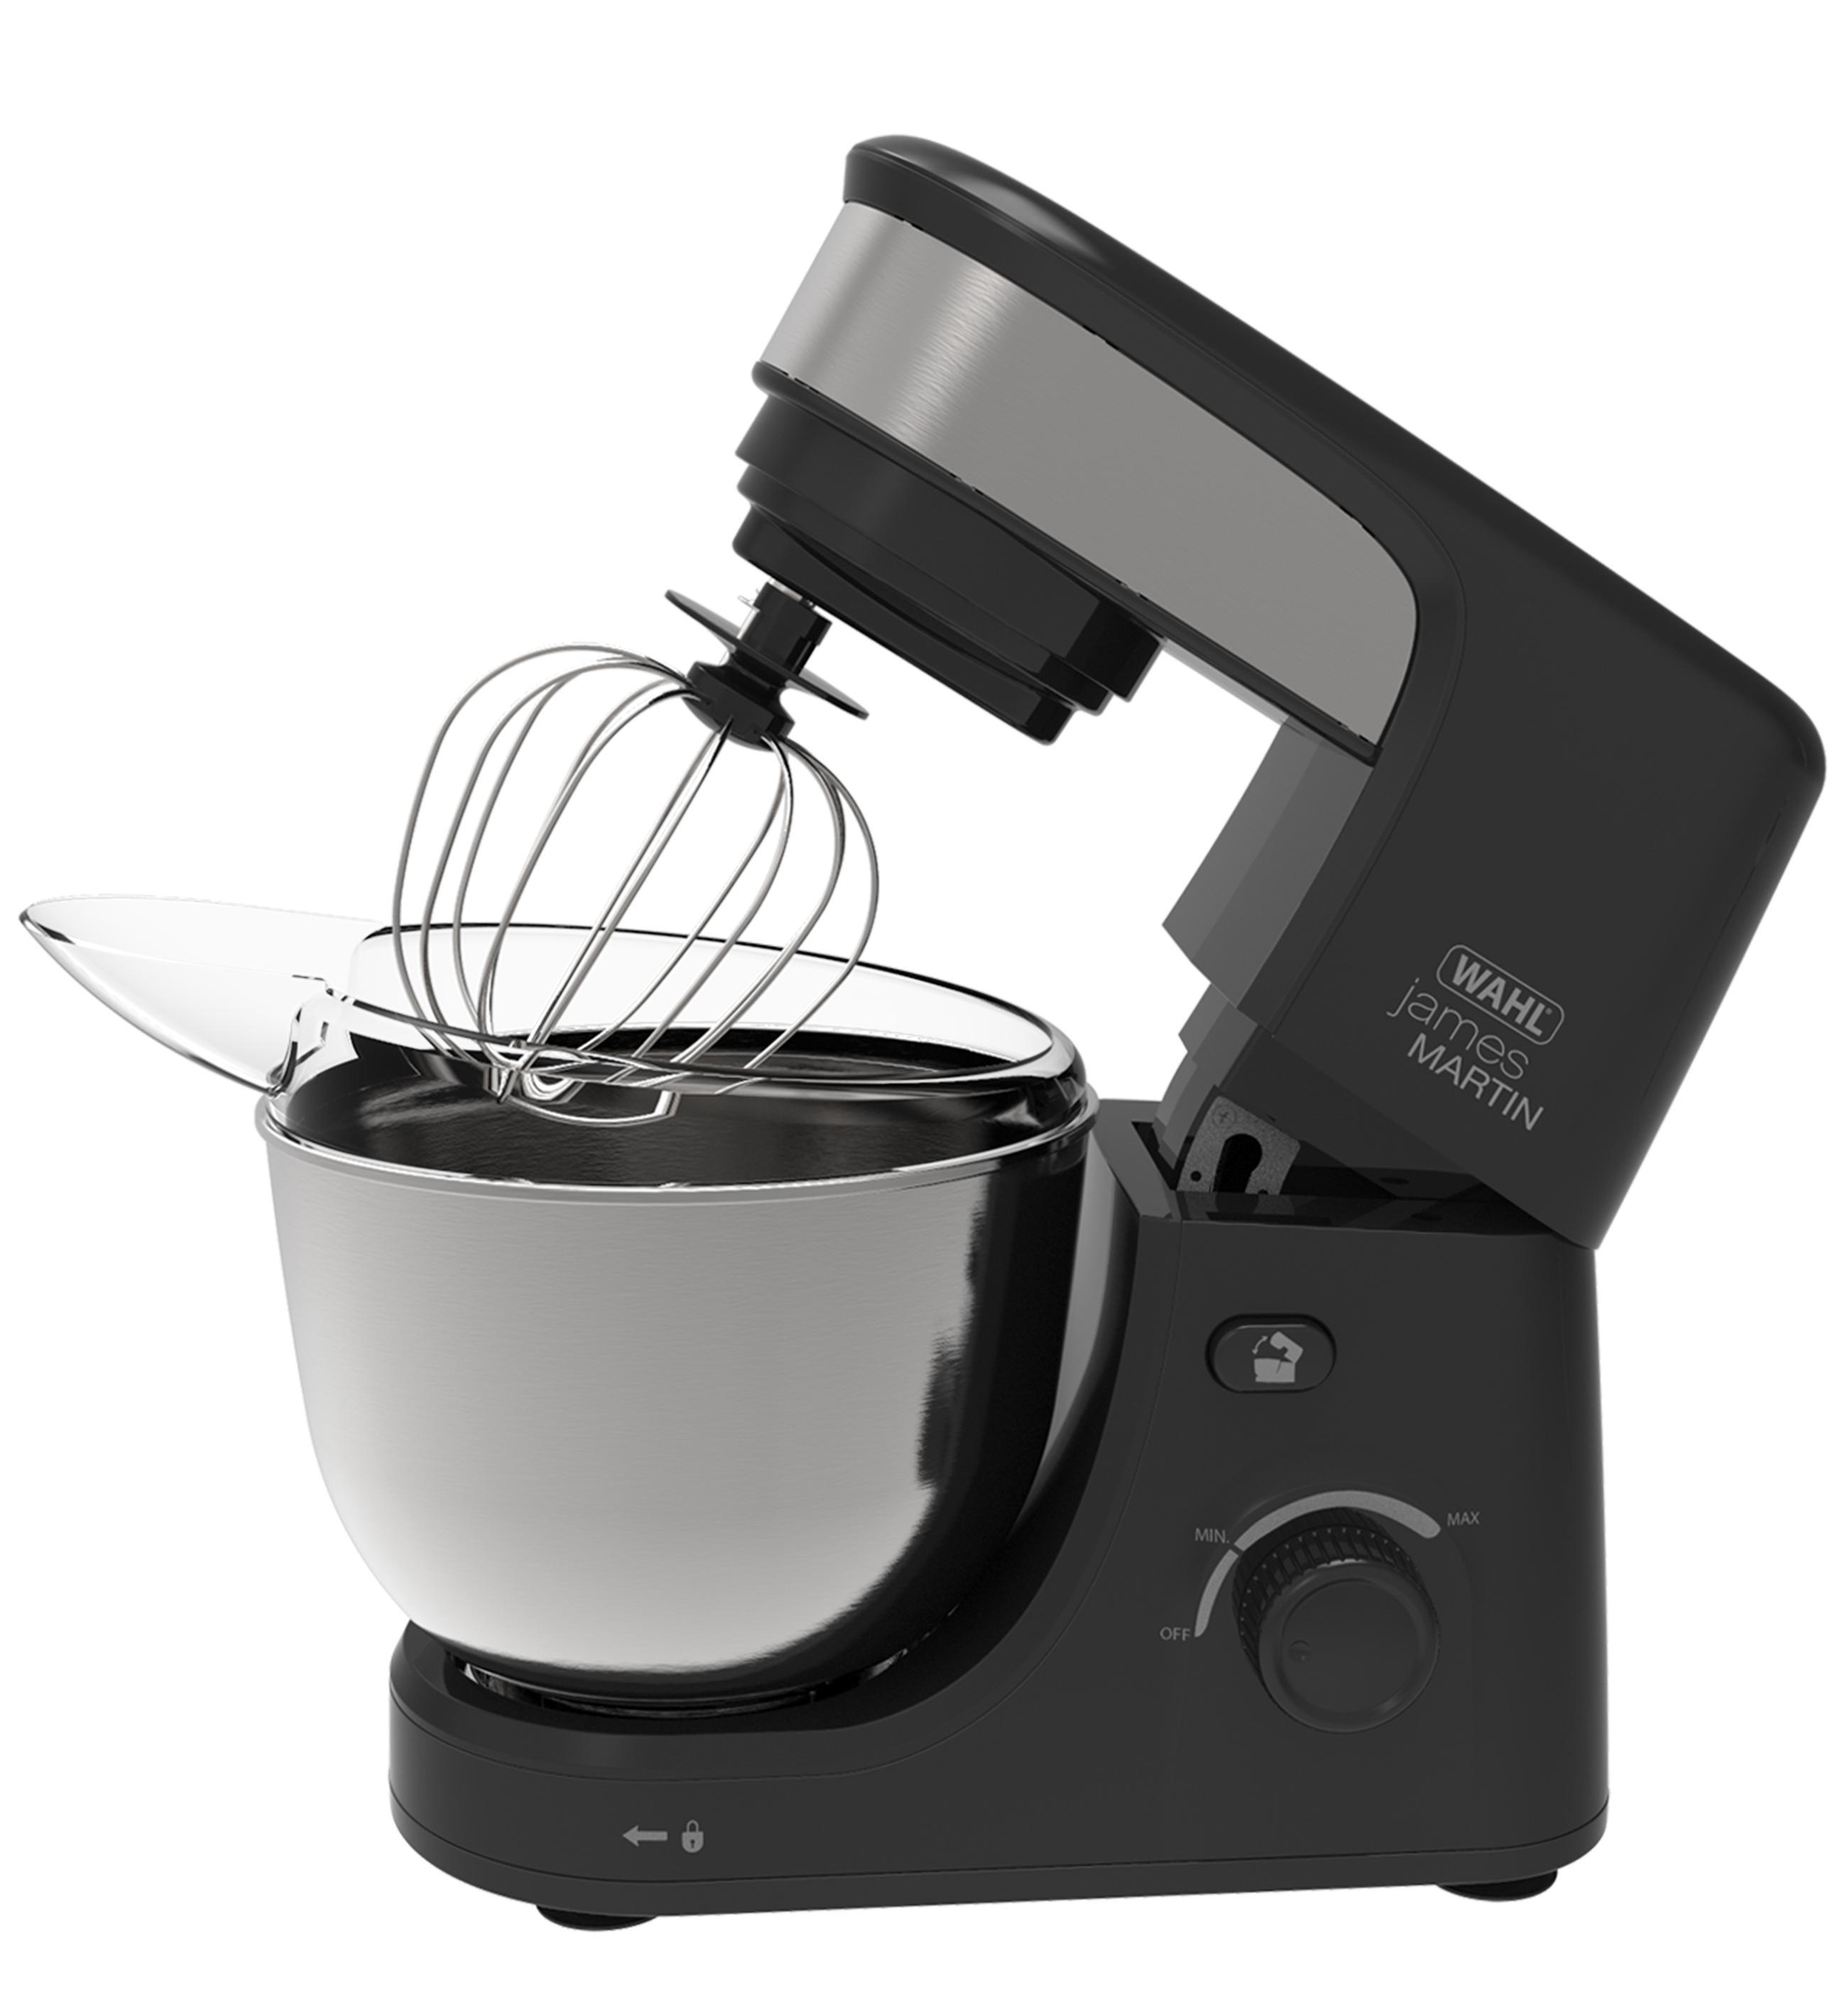 Uncategorized James Martin Kitchen Appliances wahl james martin stand mixer amazon co uk kitchen home mixer